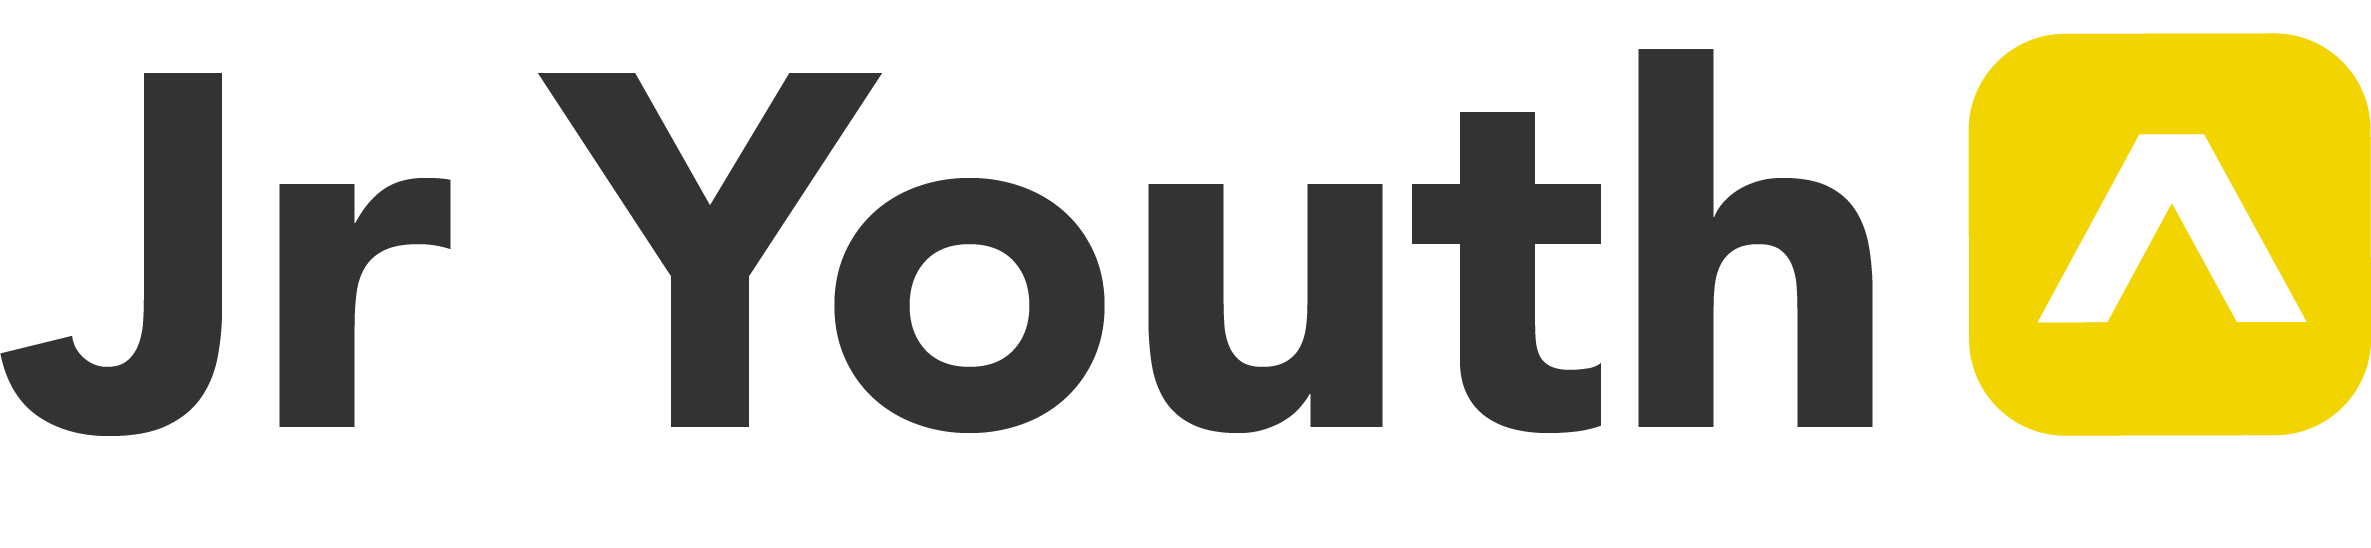 Jr_youth_logo_colour.png